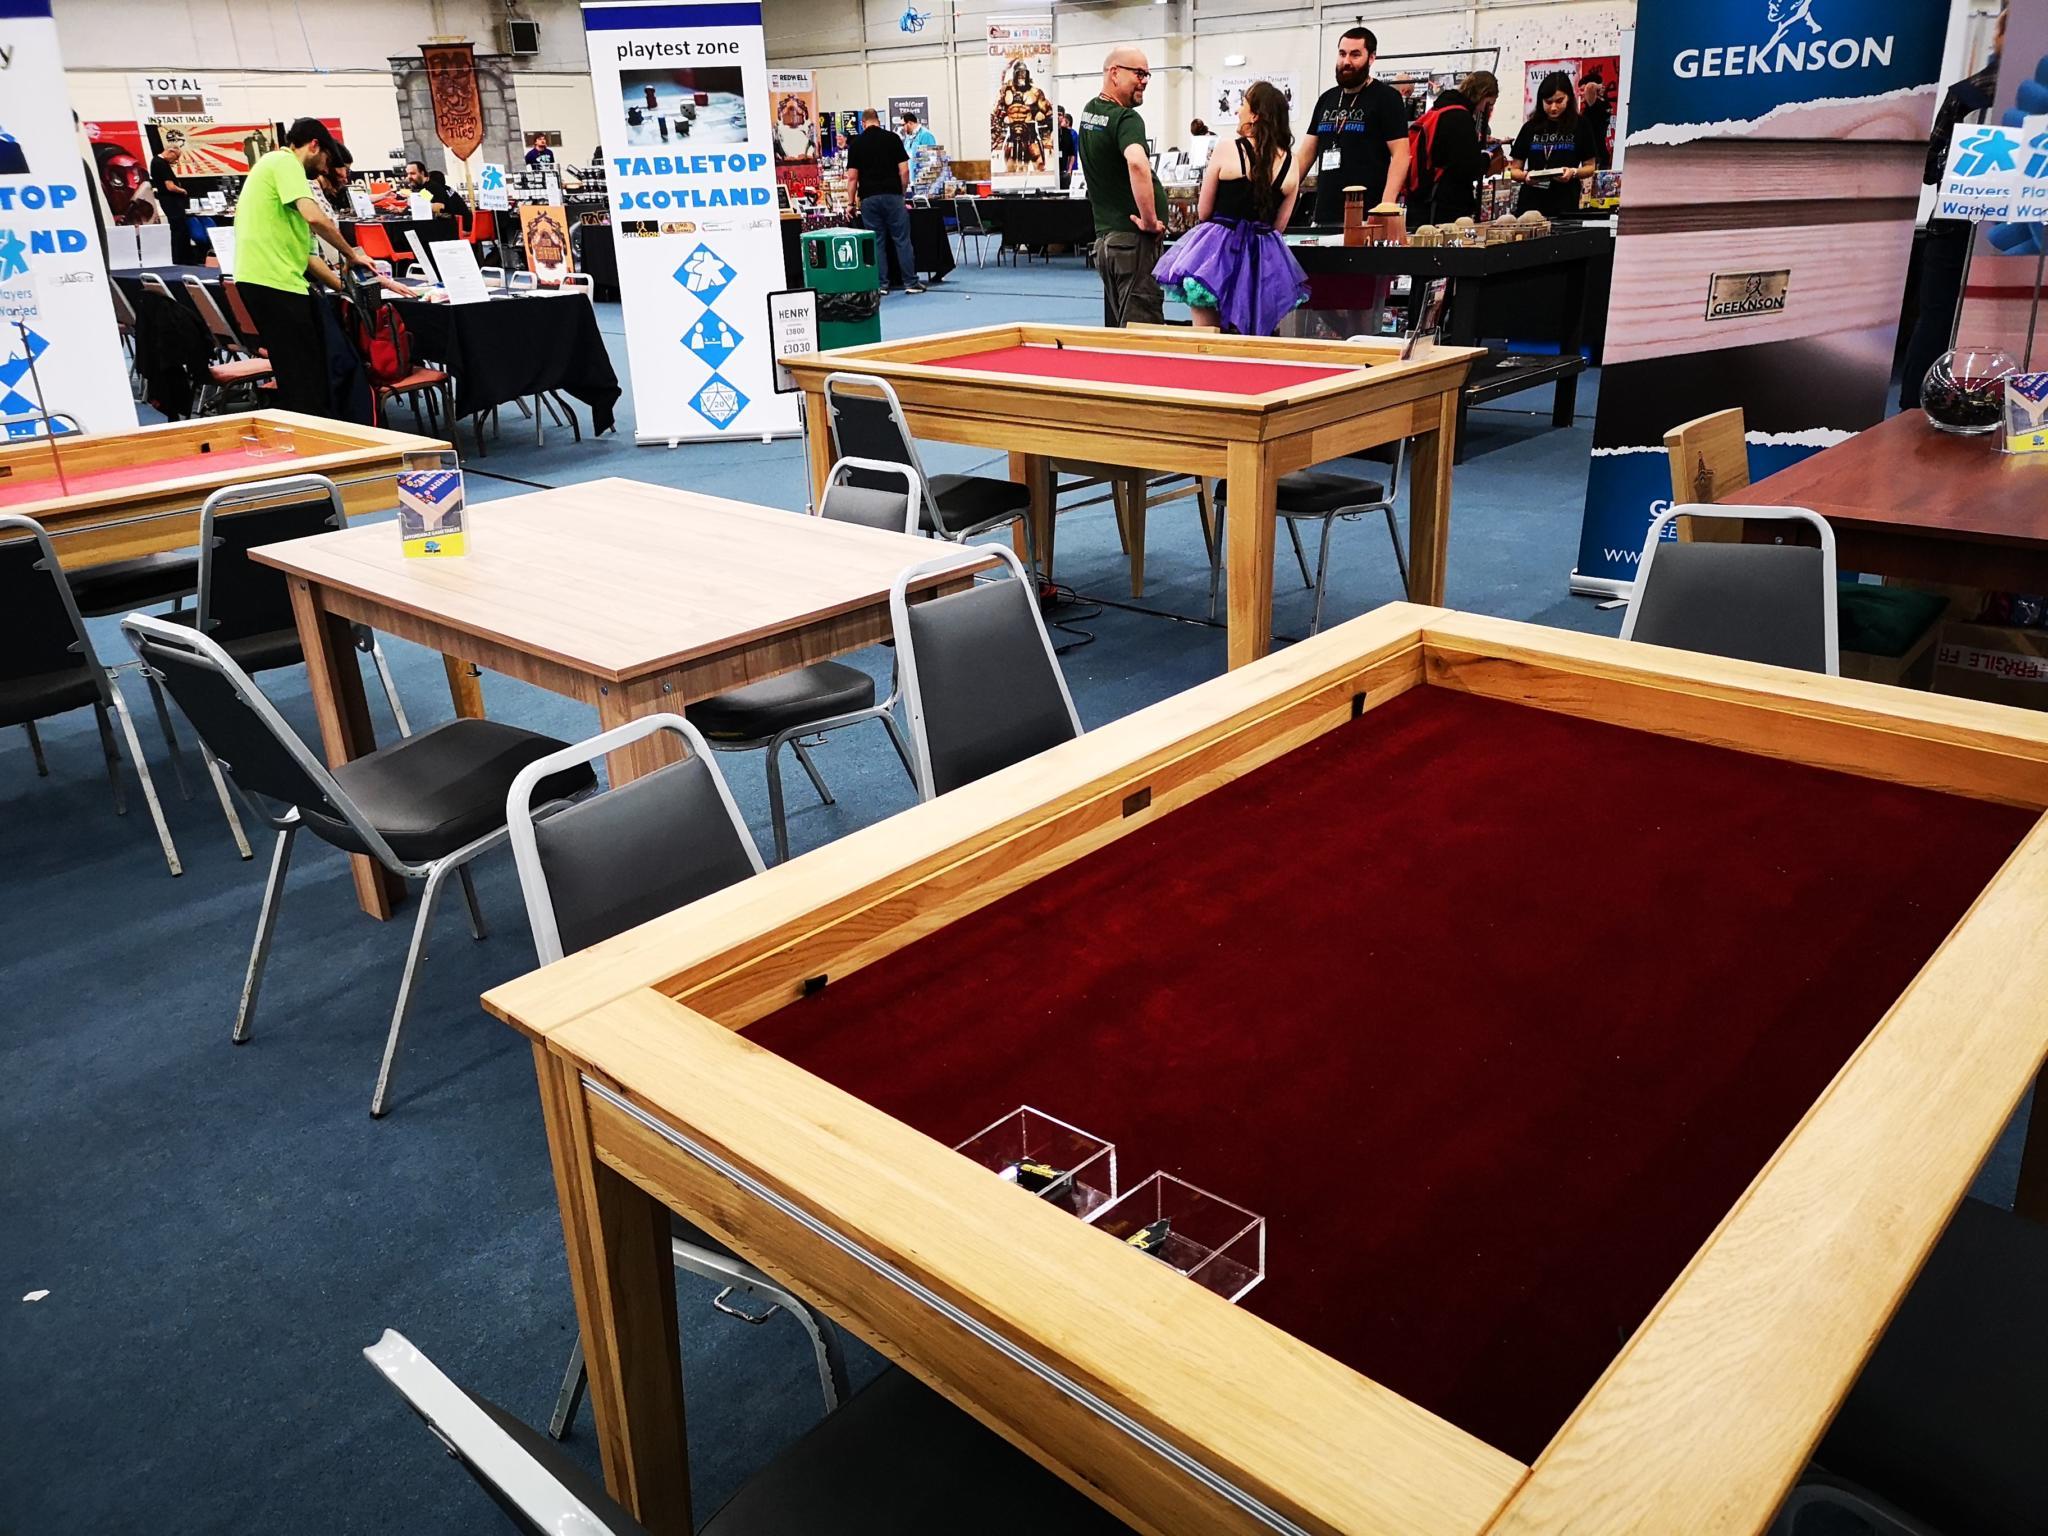 Geeksnson tables